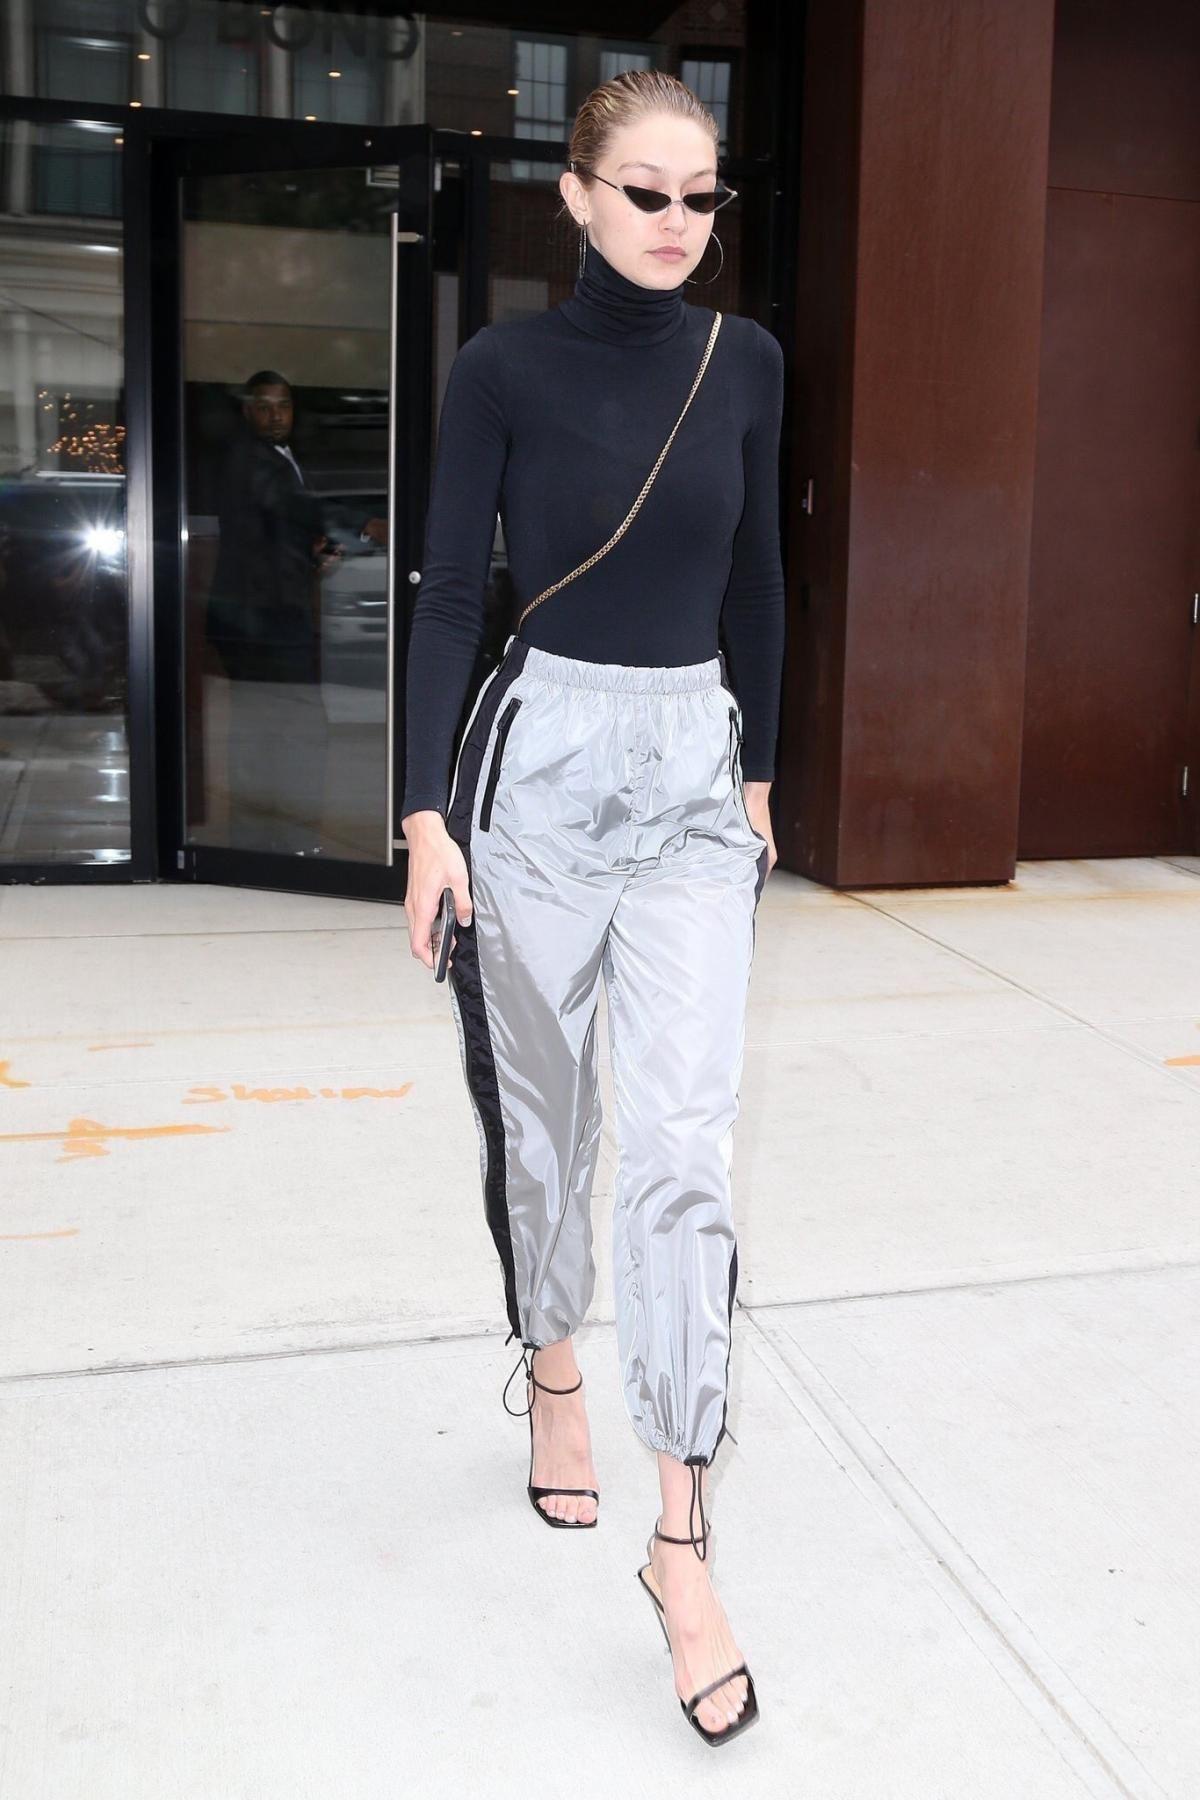 b0834237a88 Gigi Hadid wearing Prada Silver Track Pants